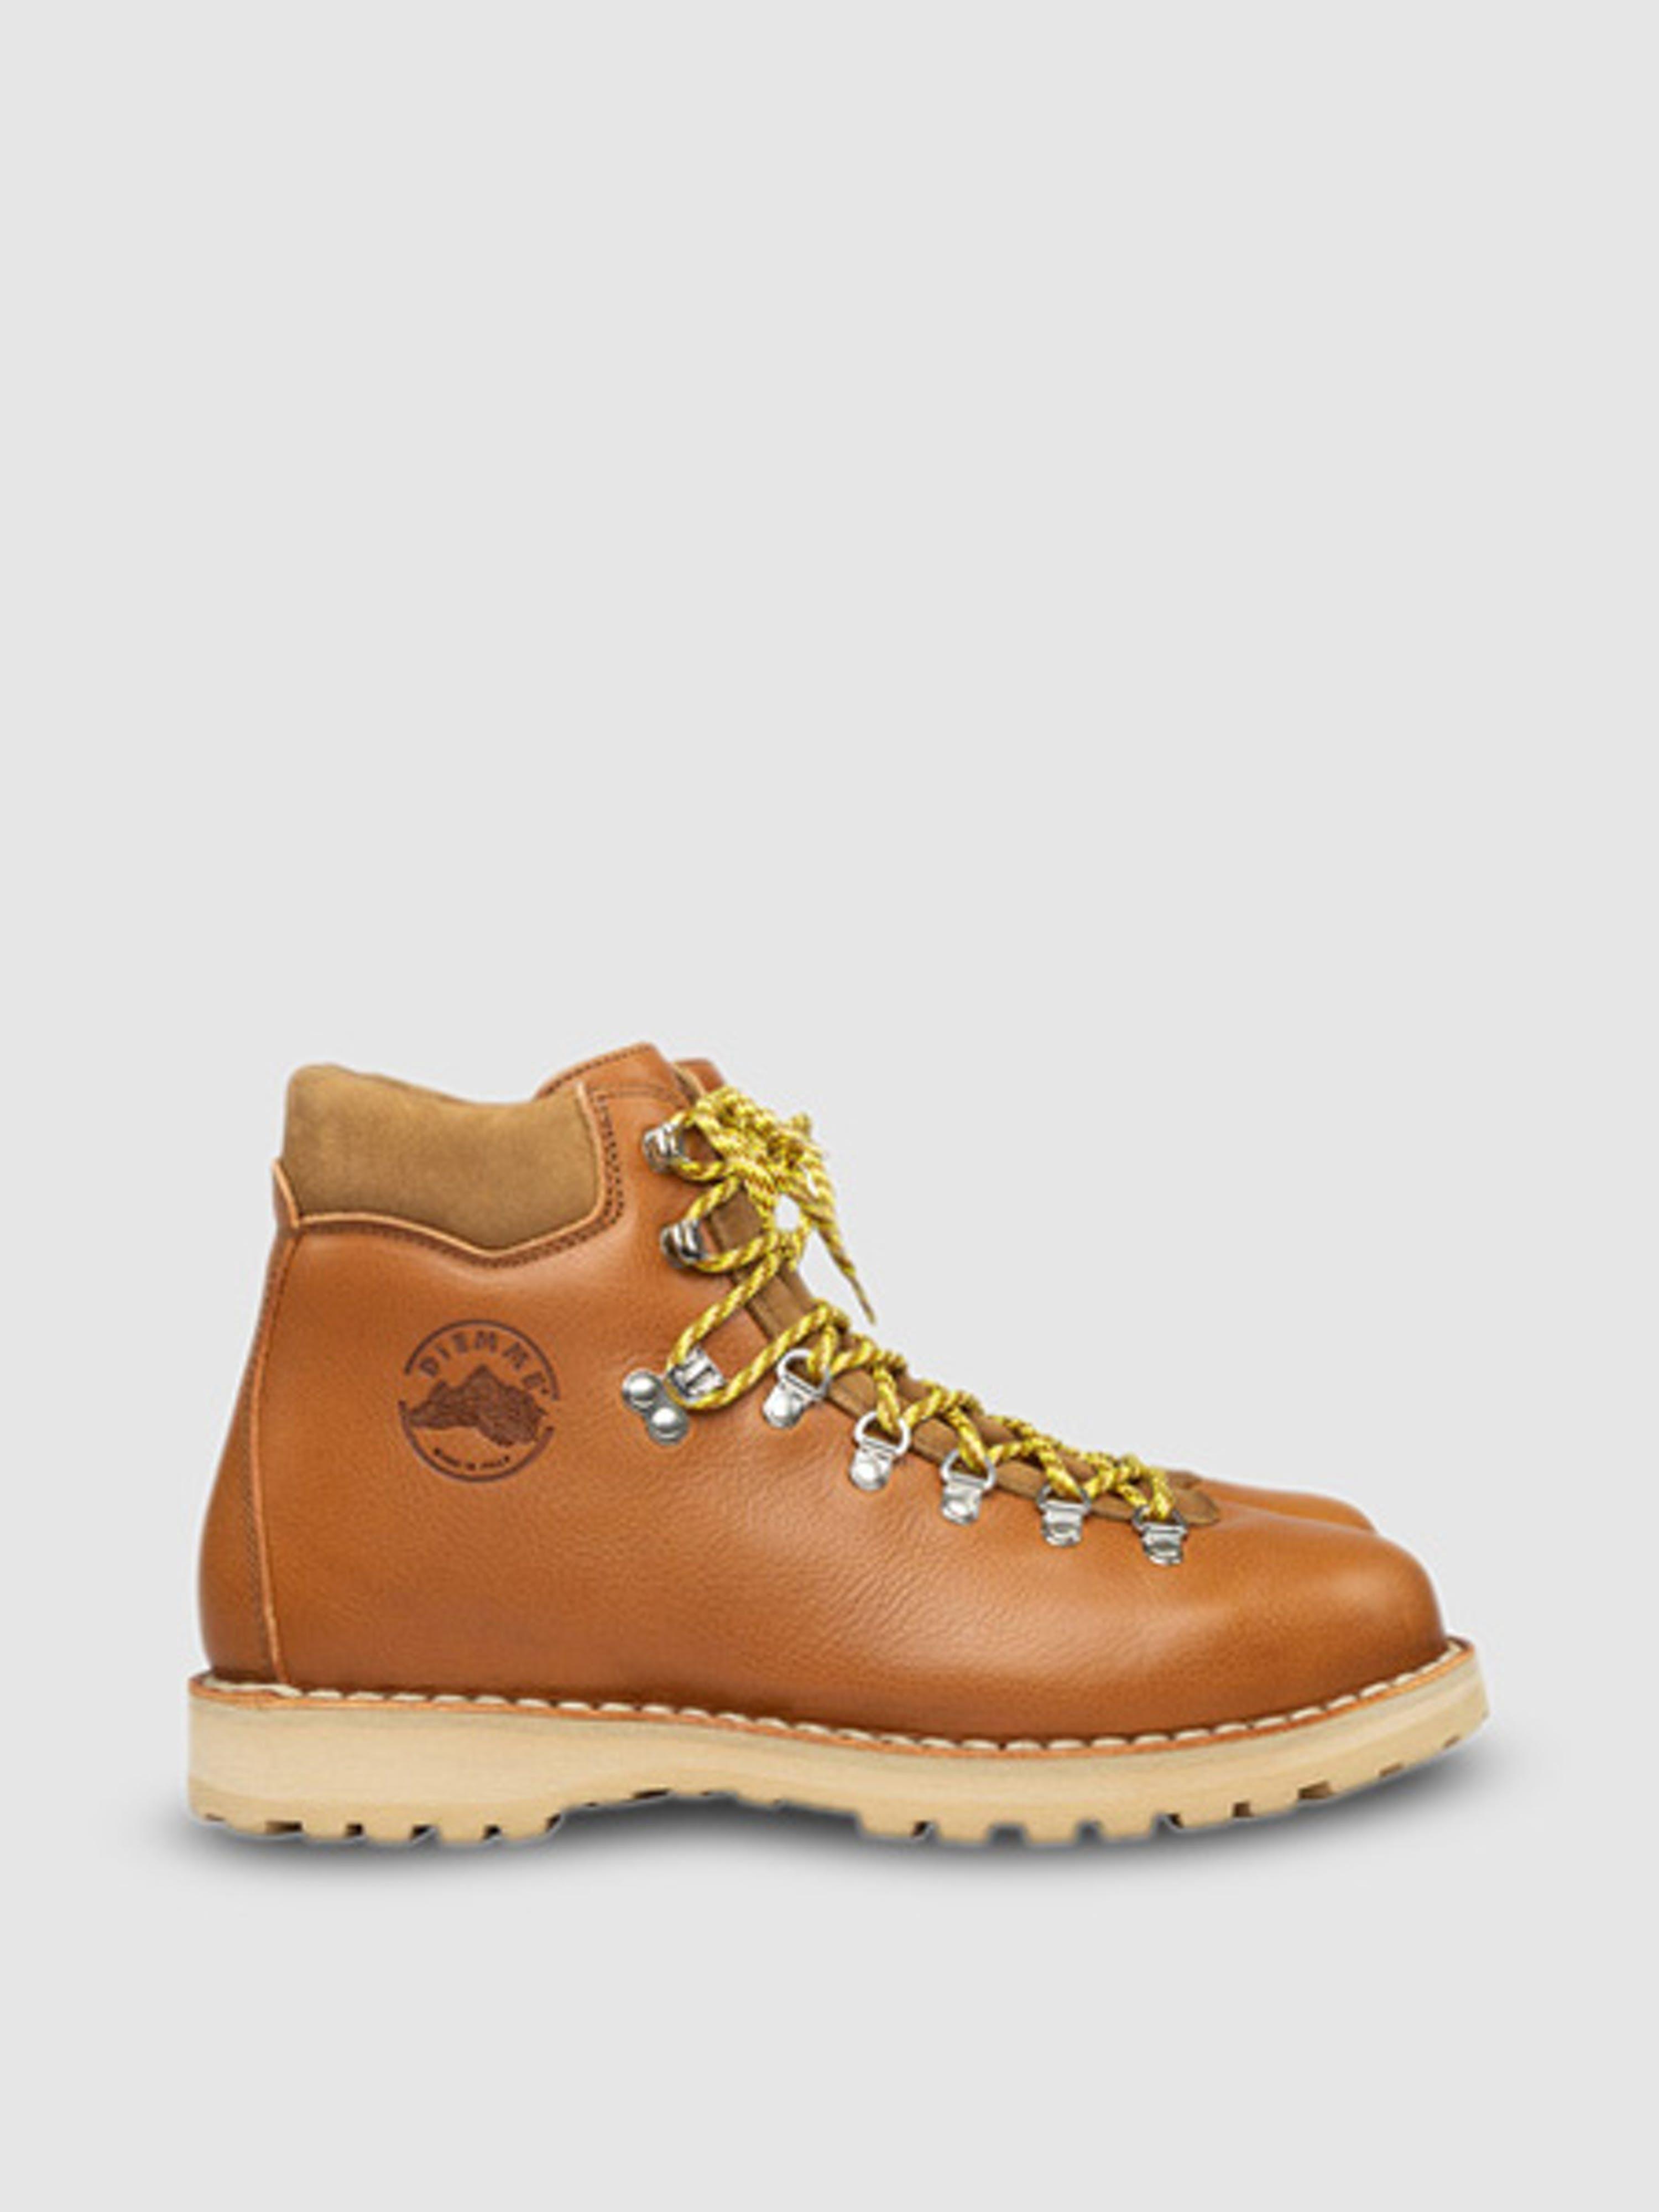 Diemme Roccia Vet Boot  - Brown